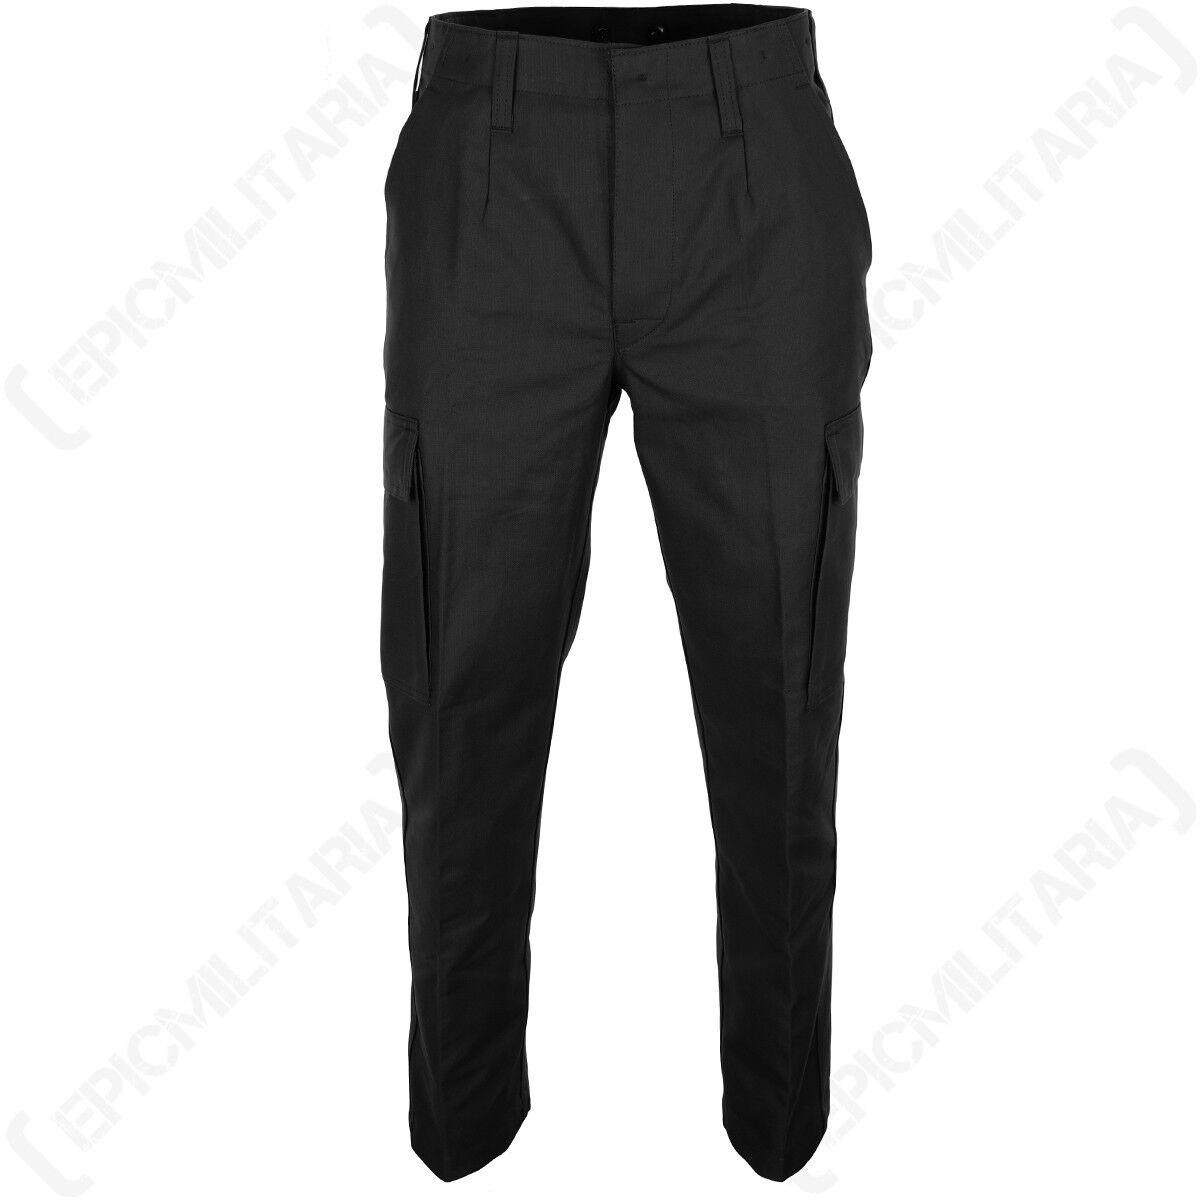 Original Grade Moleskin Trousers - Cargo Combat Army Work Pant Colour Option New